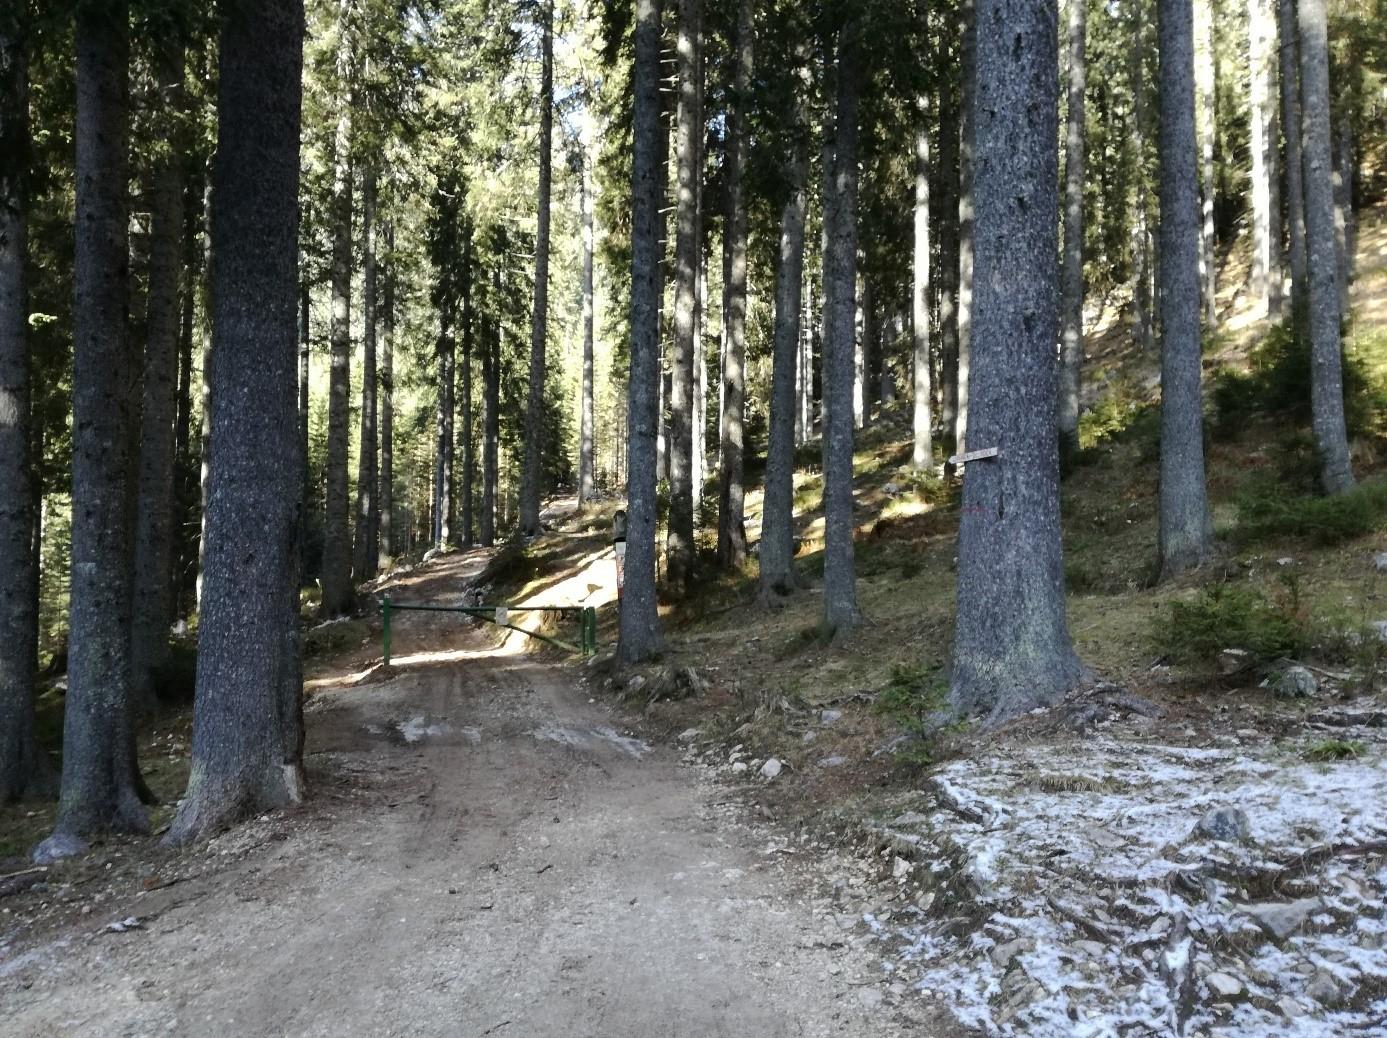 The starting point at Medvedova konta.